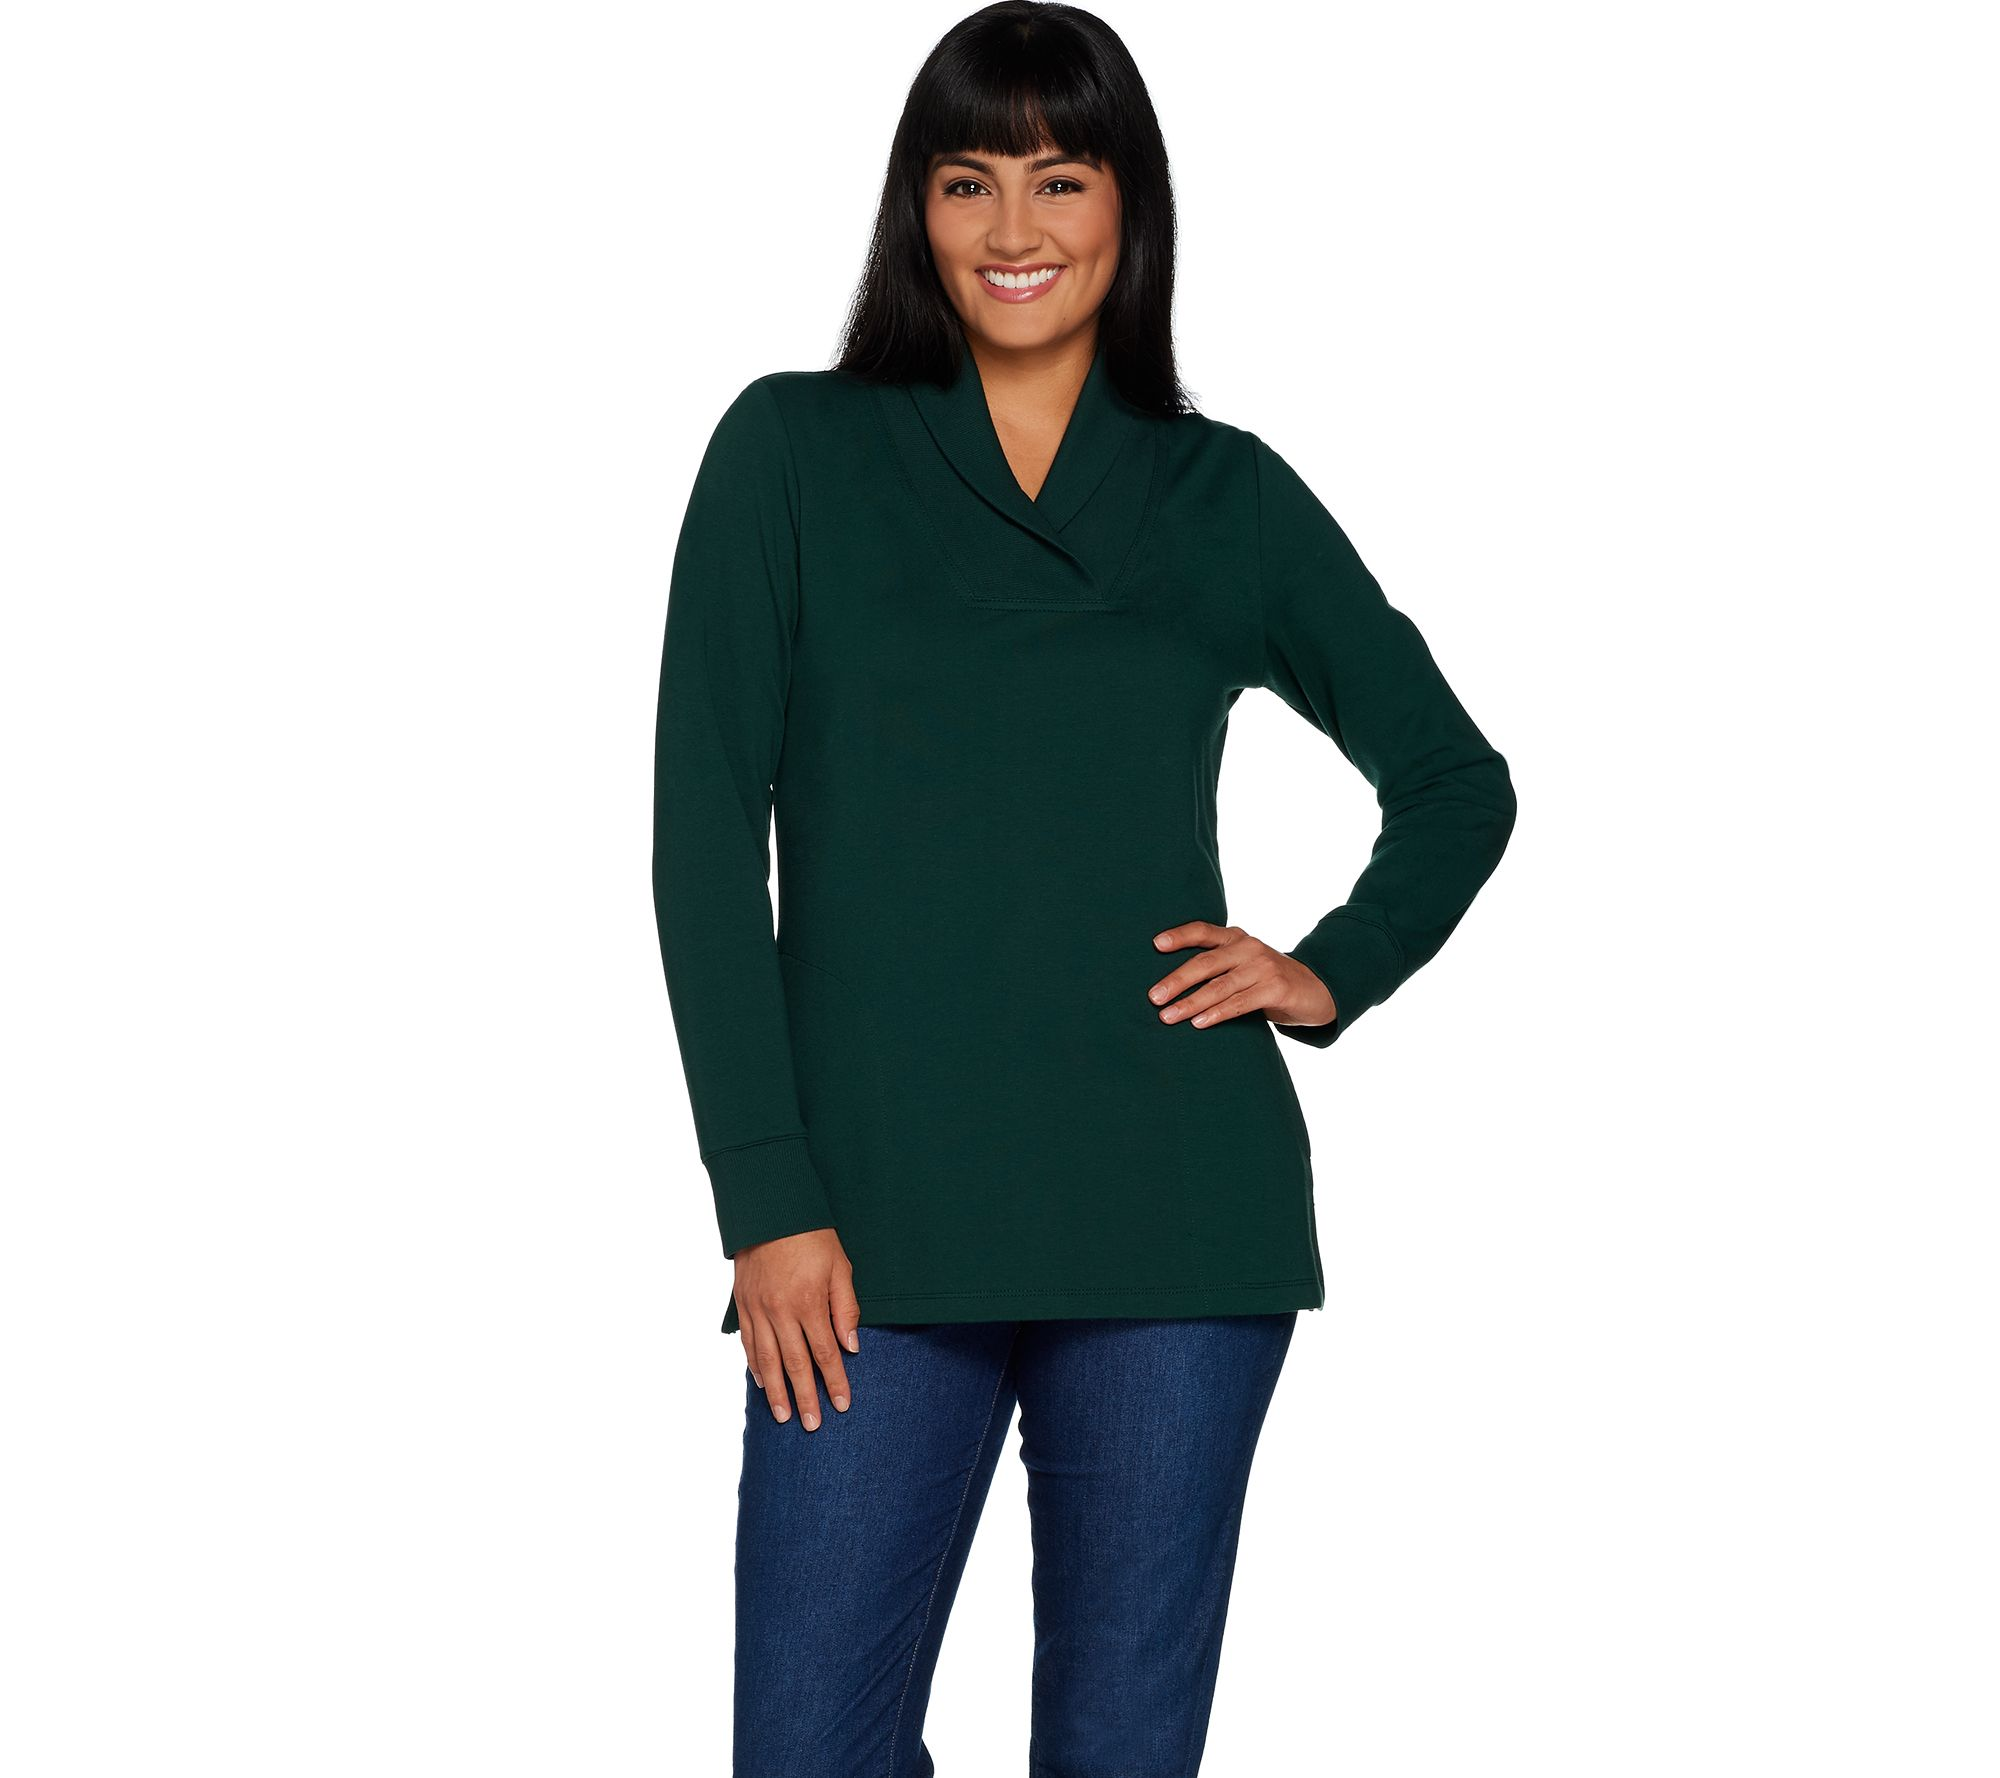 Blouses & Tops — Fashion — QVC.com